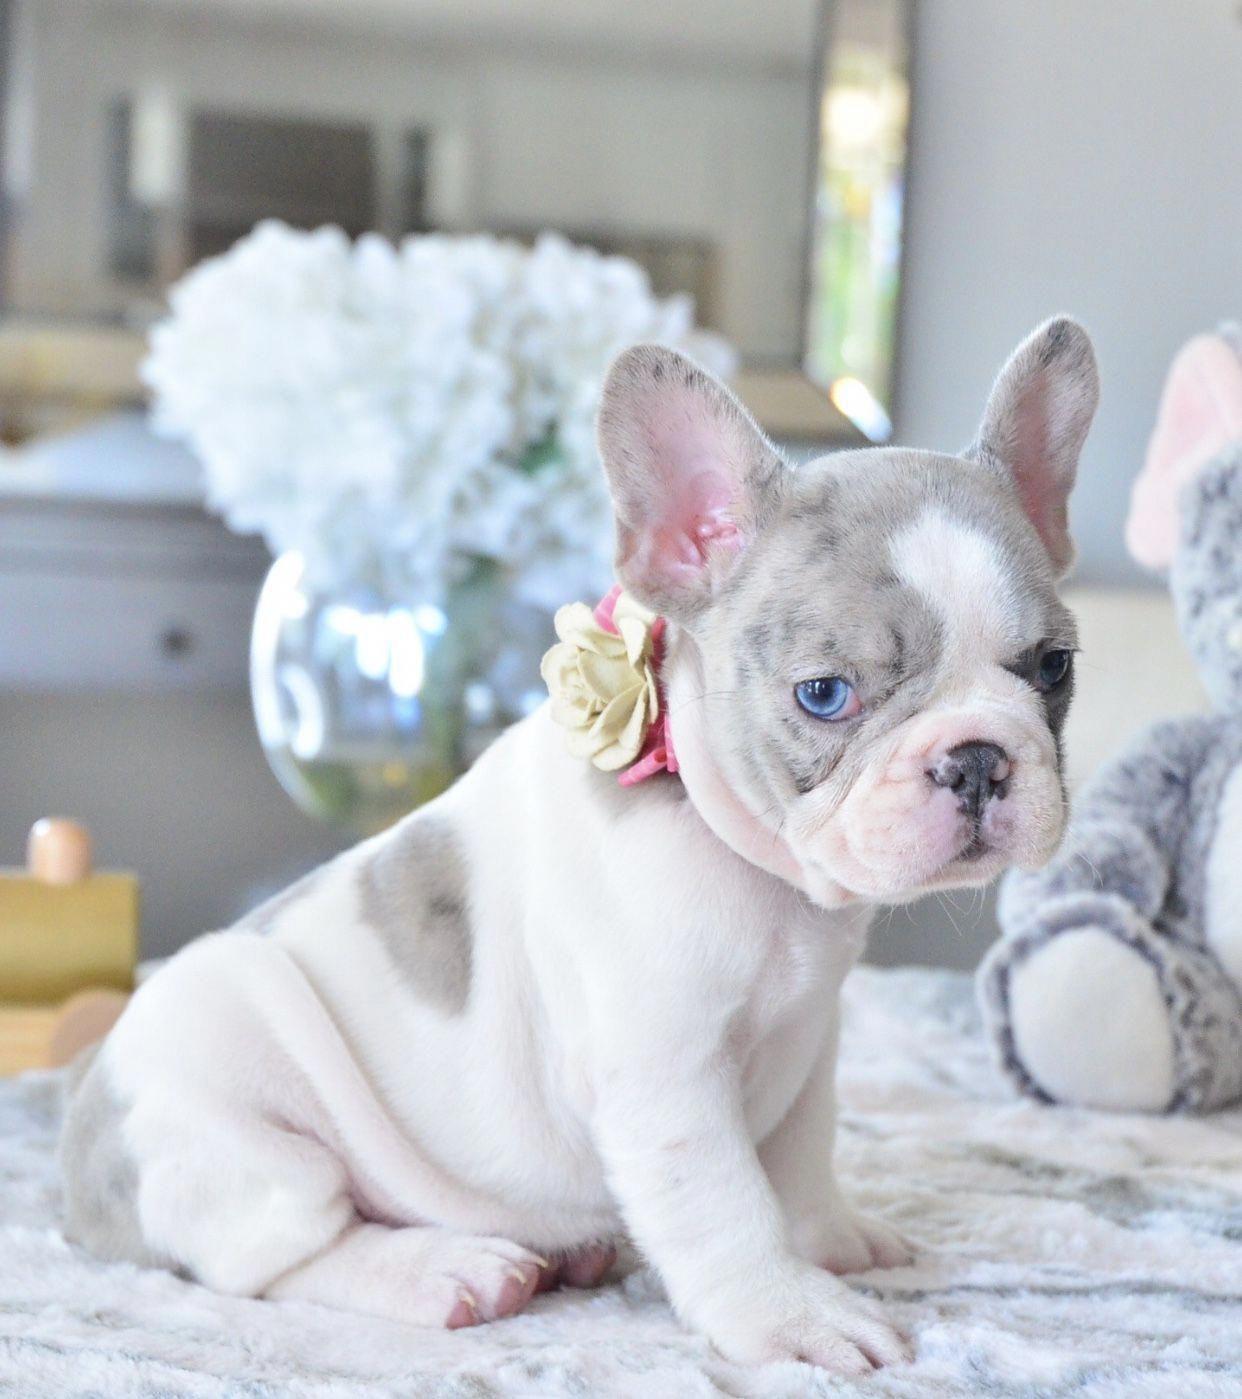 French Bulldog Playful And Smart Bulldog Puppies For Sale French Bulldog Puppies Cute Dogs And Puppies